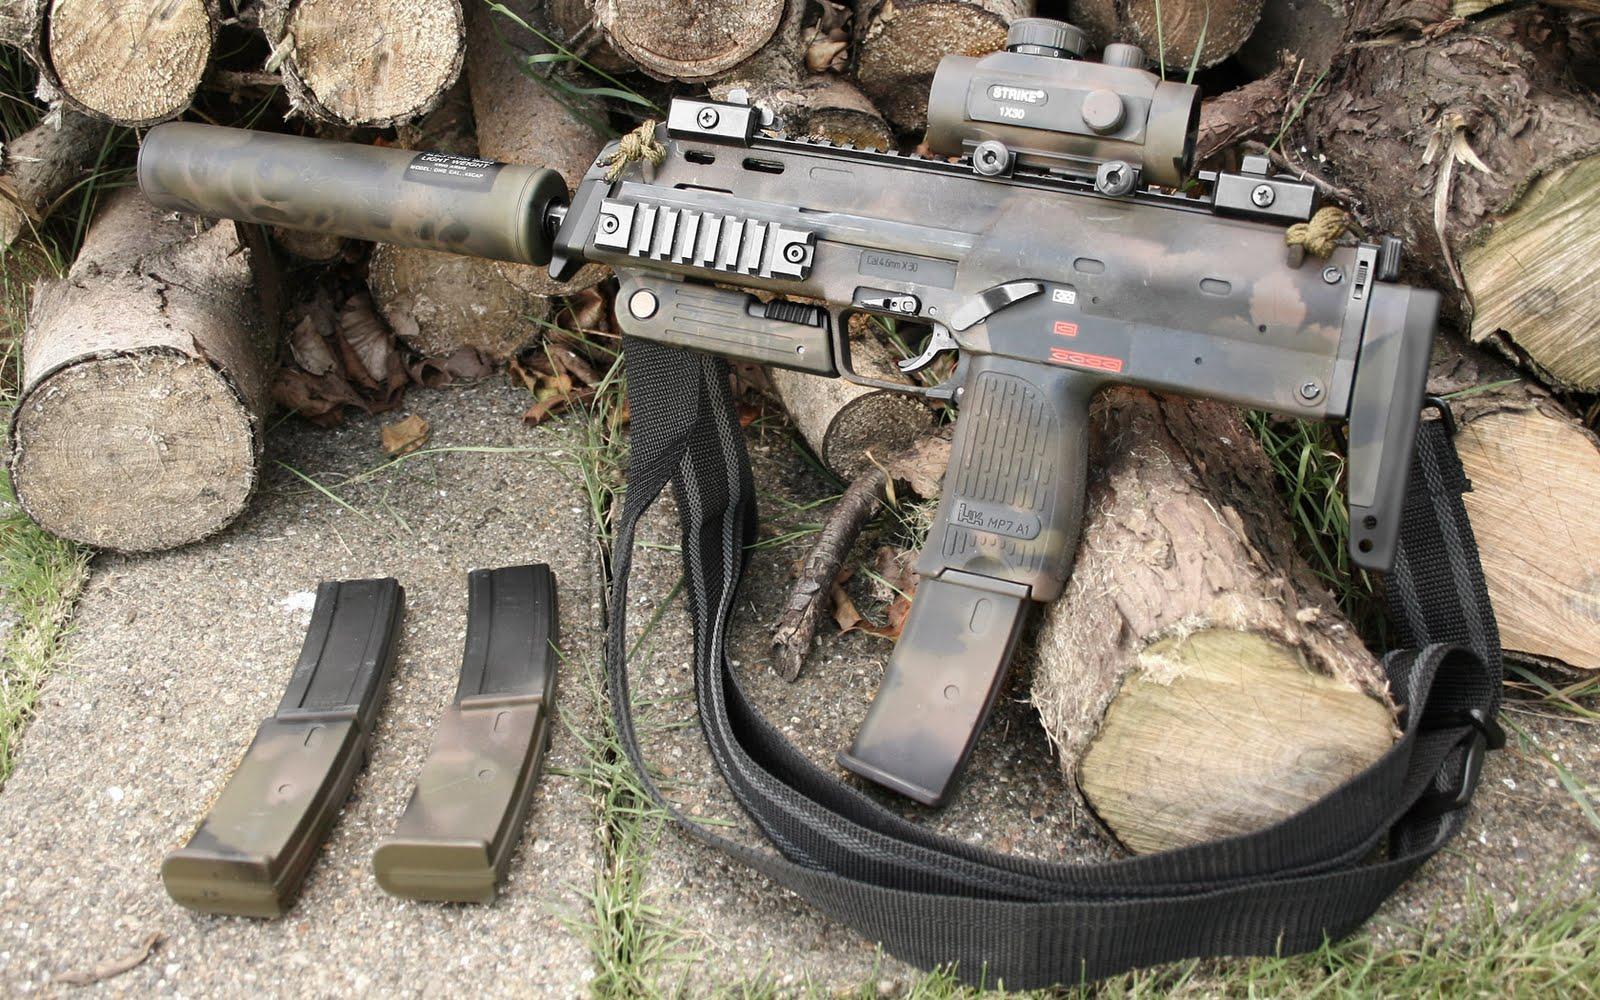 Heckler - Koch HK MP7A1 submachine gun ...